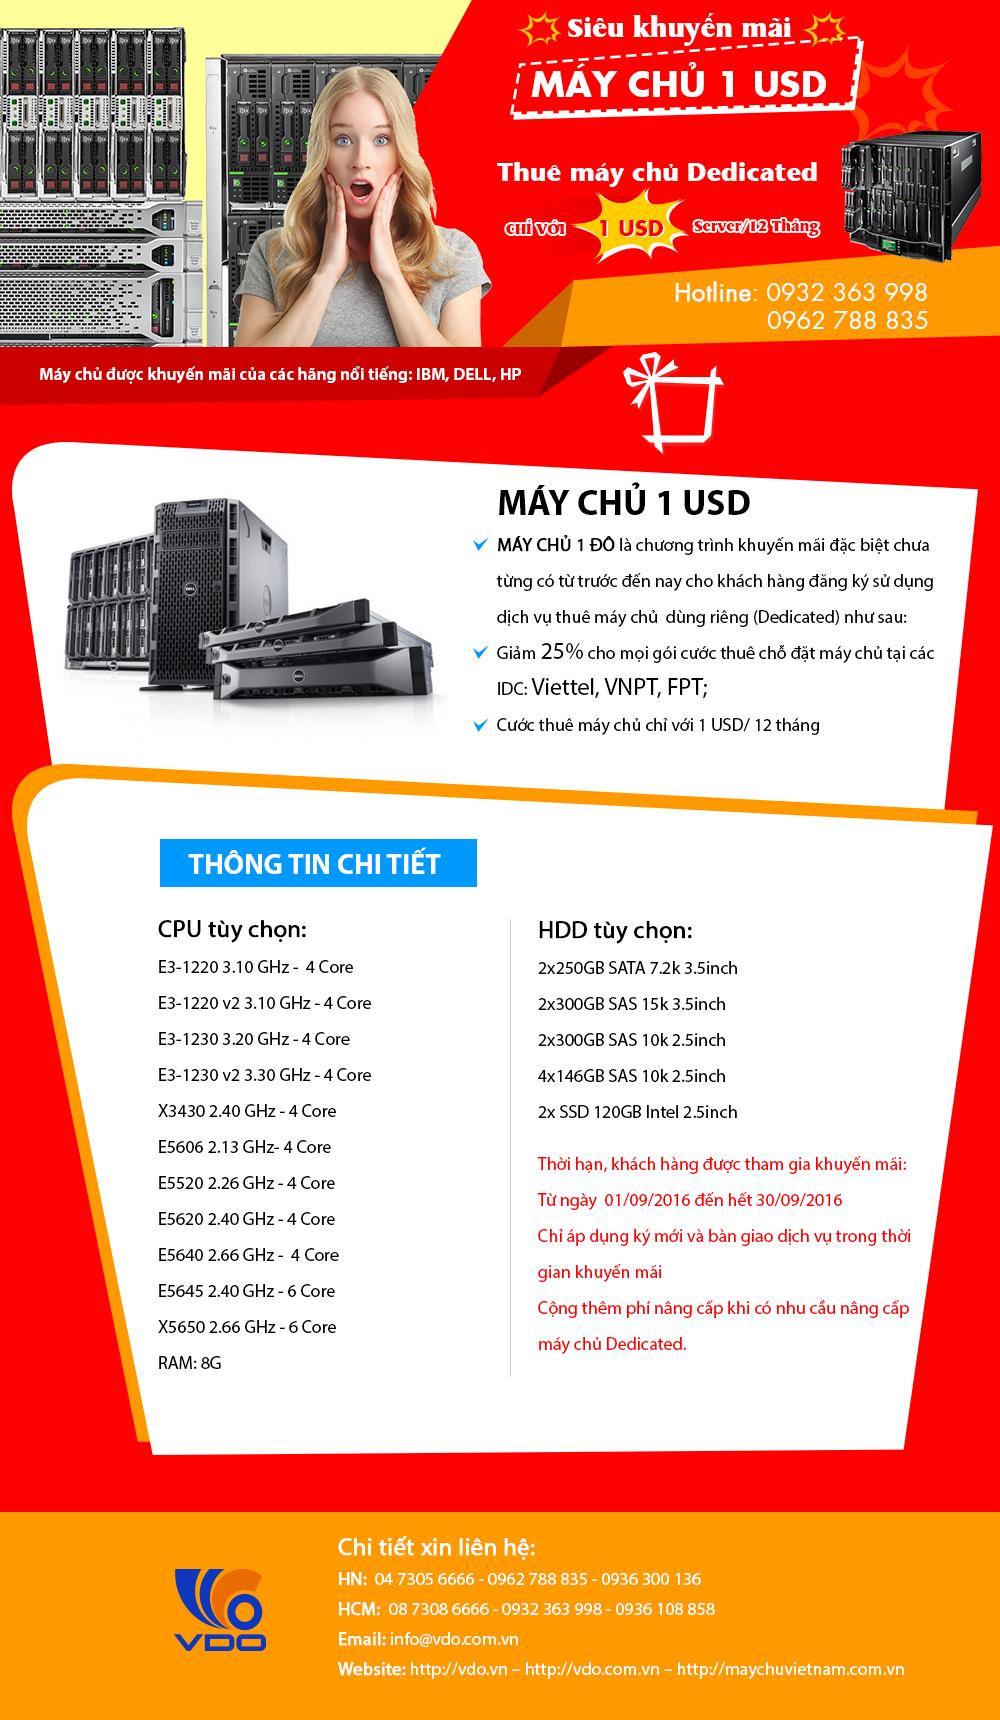 THUÊ MÁY CHỦ 1 USD